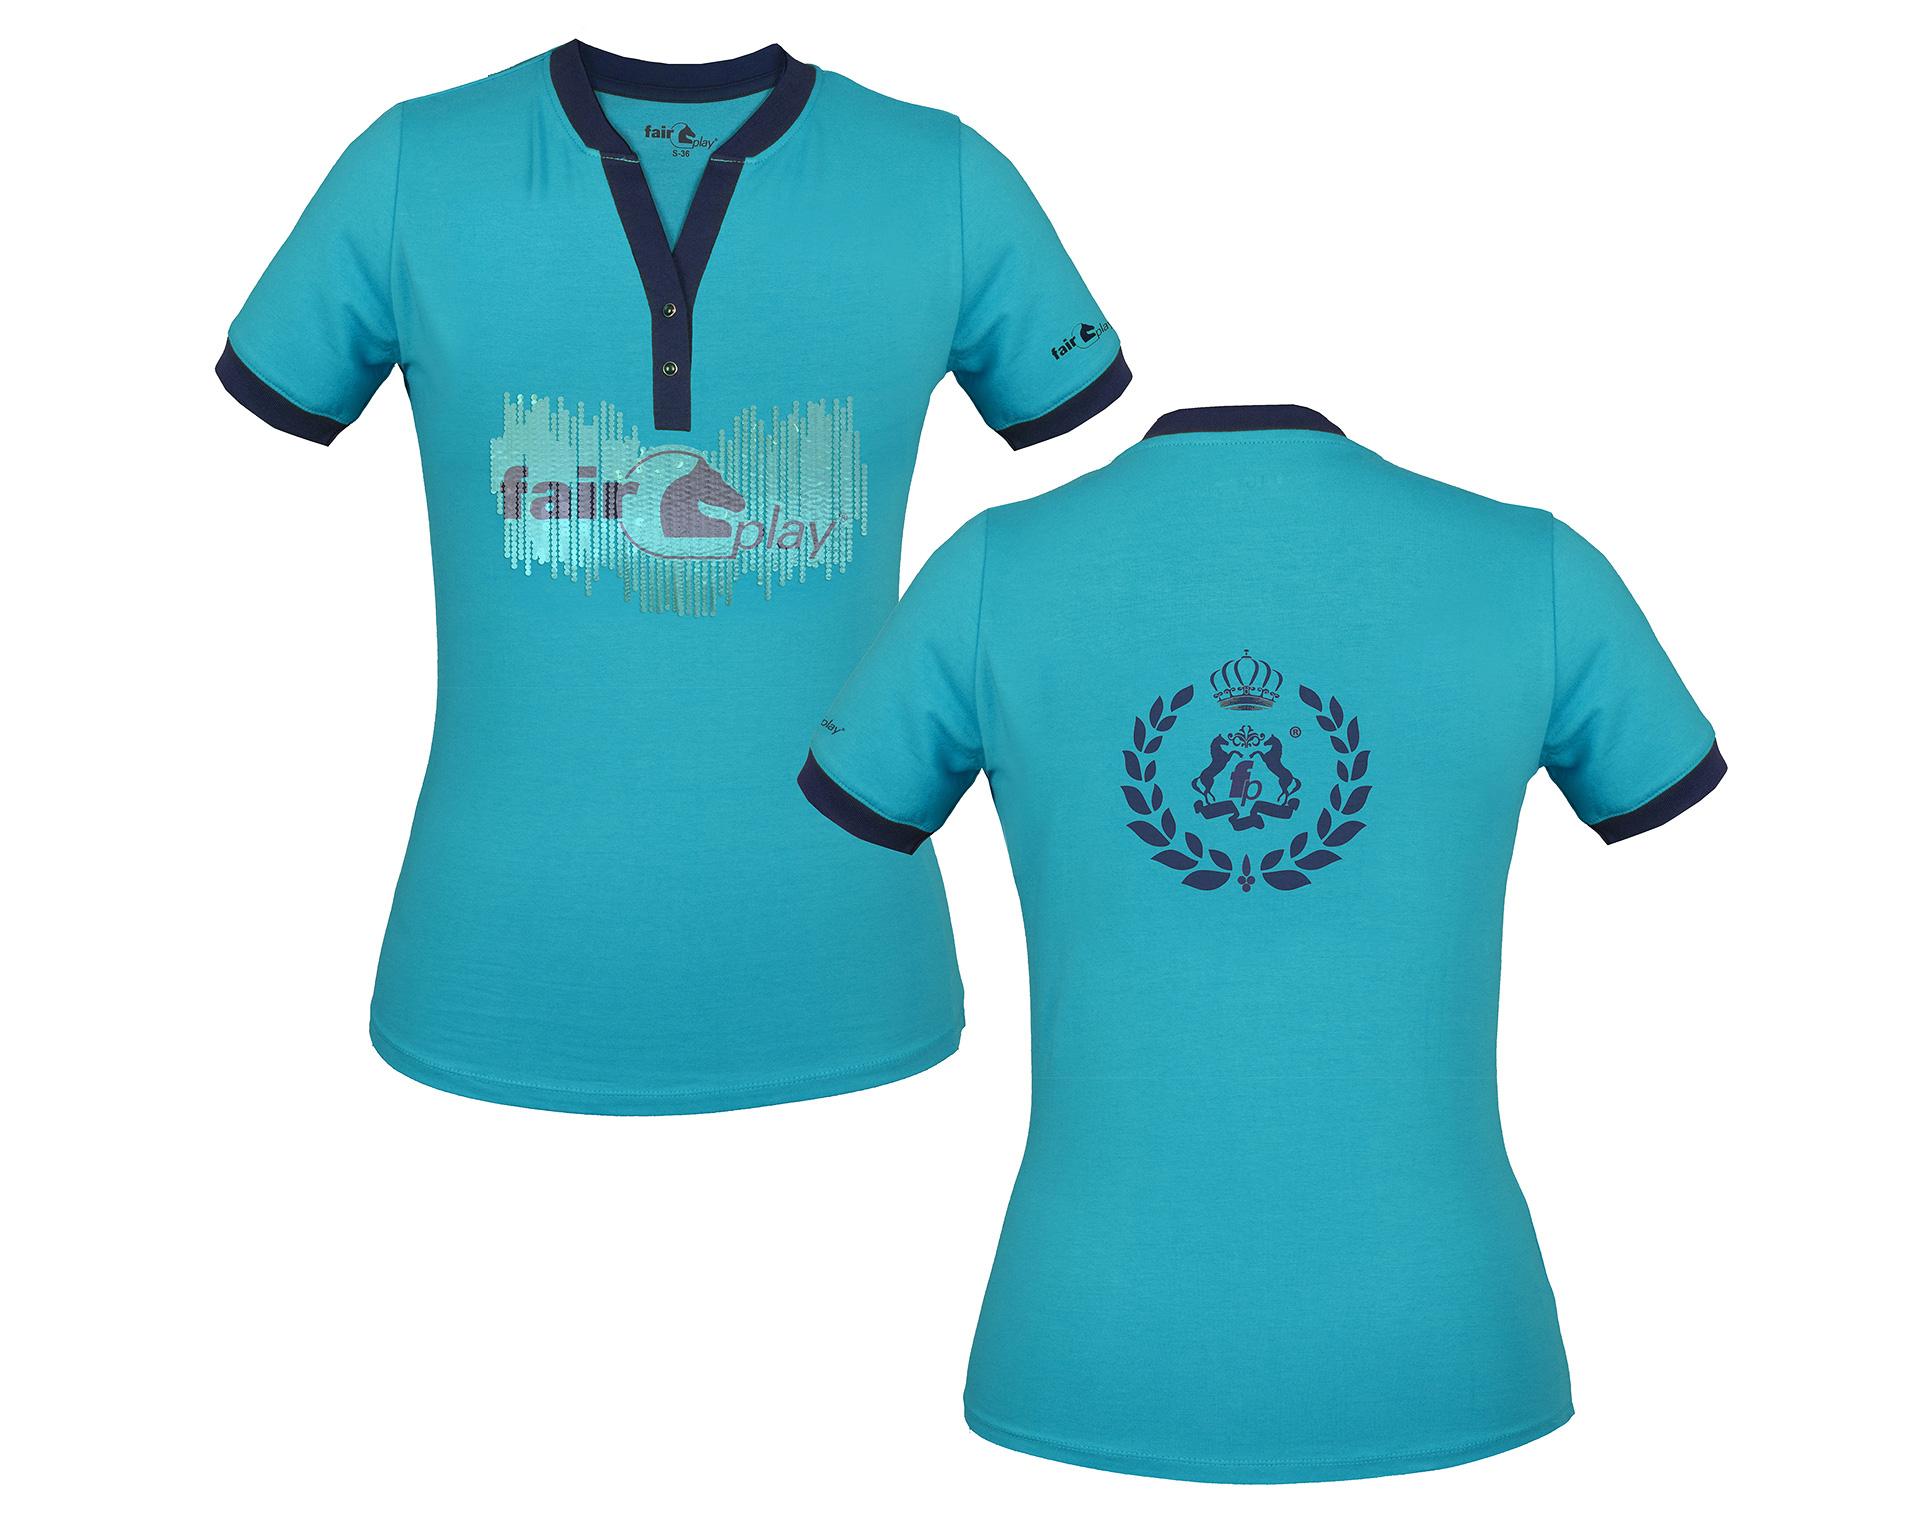 e6ffeef1cc T-Shirt – Equestrian Diva Couture